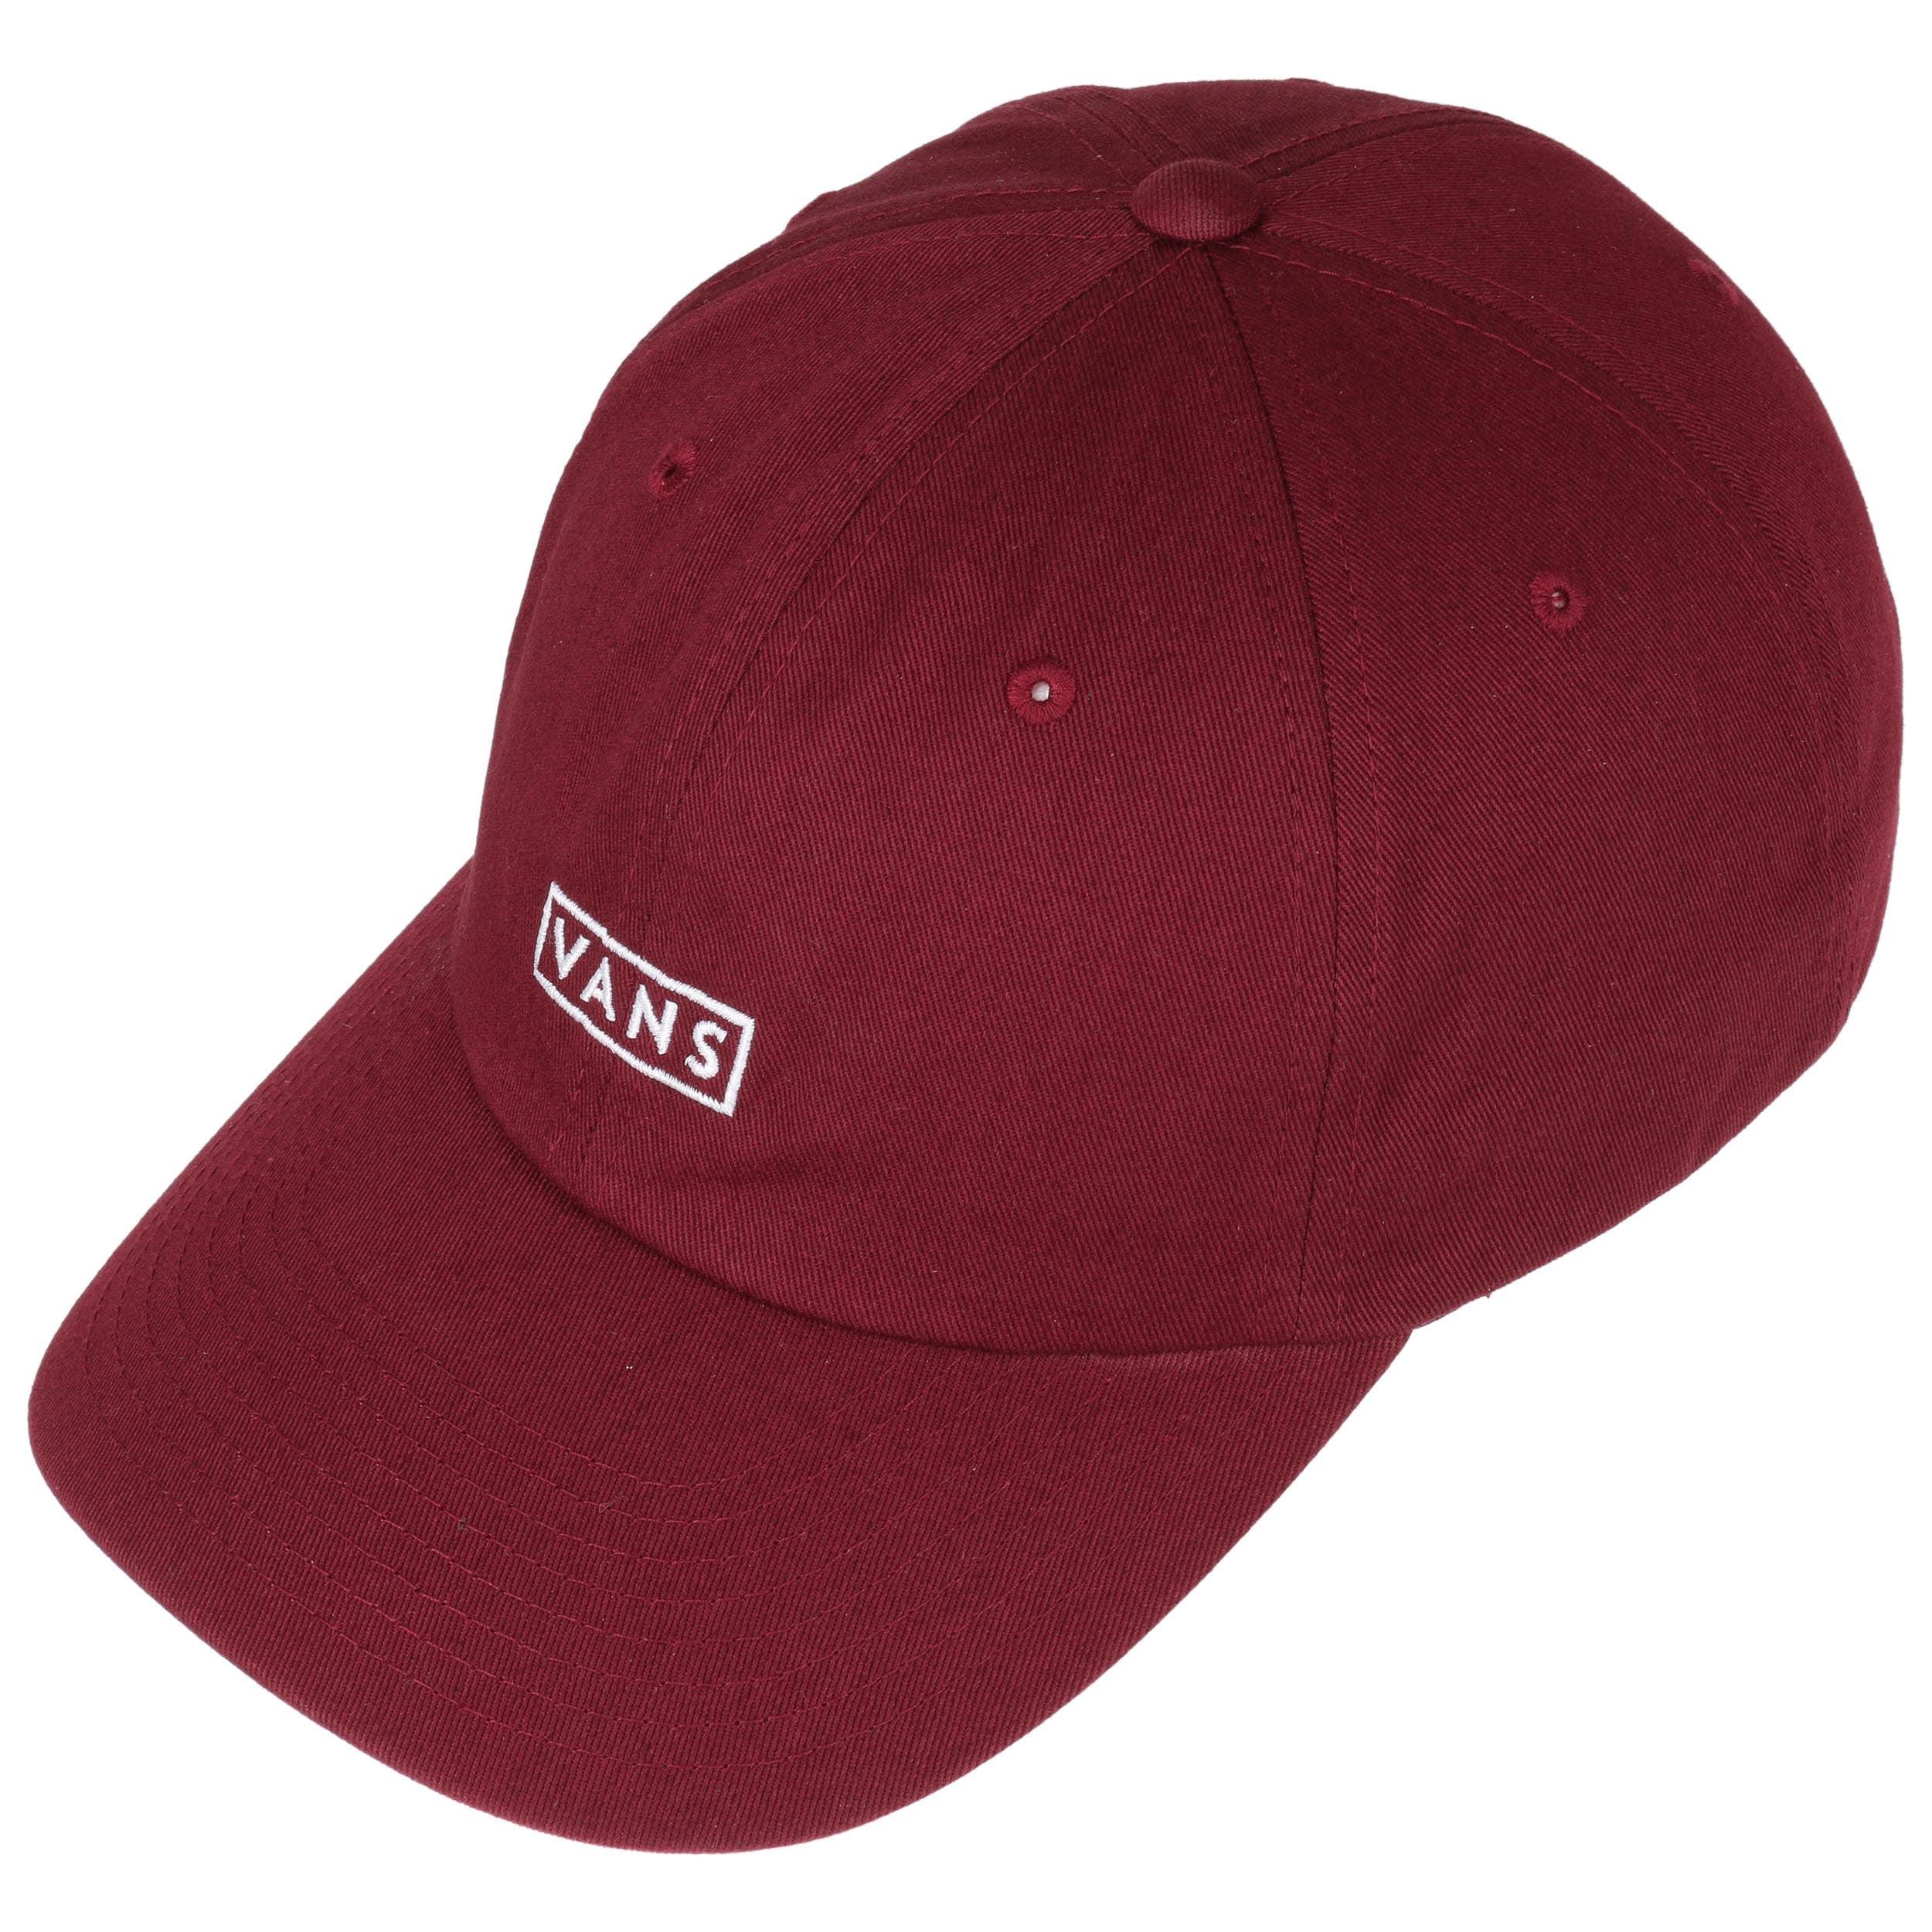 vans red hat   OFF53% Discounts 0e5a3aae949